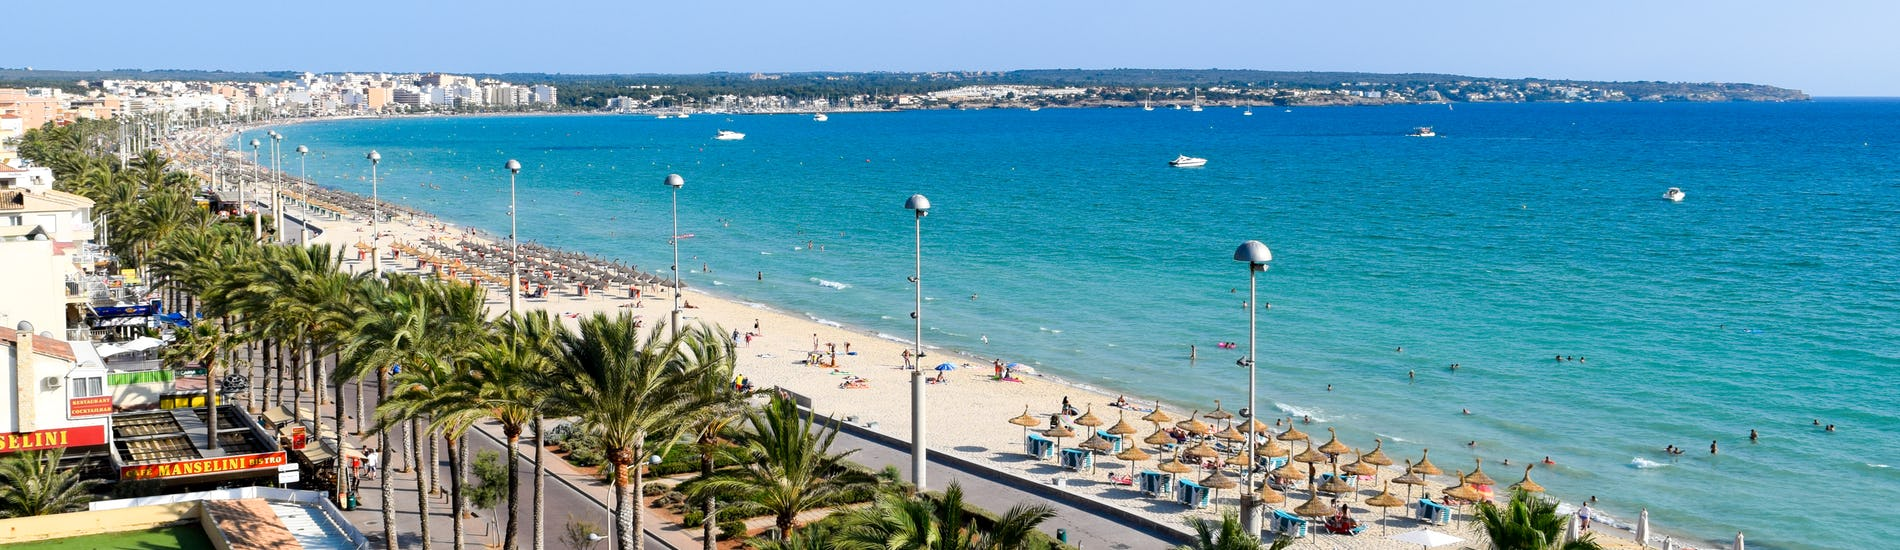 Mallorca Hotel An Der Playa De Palma